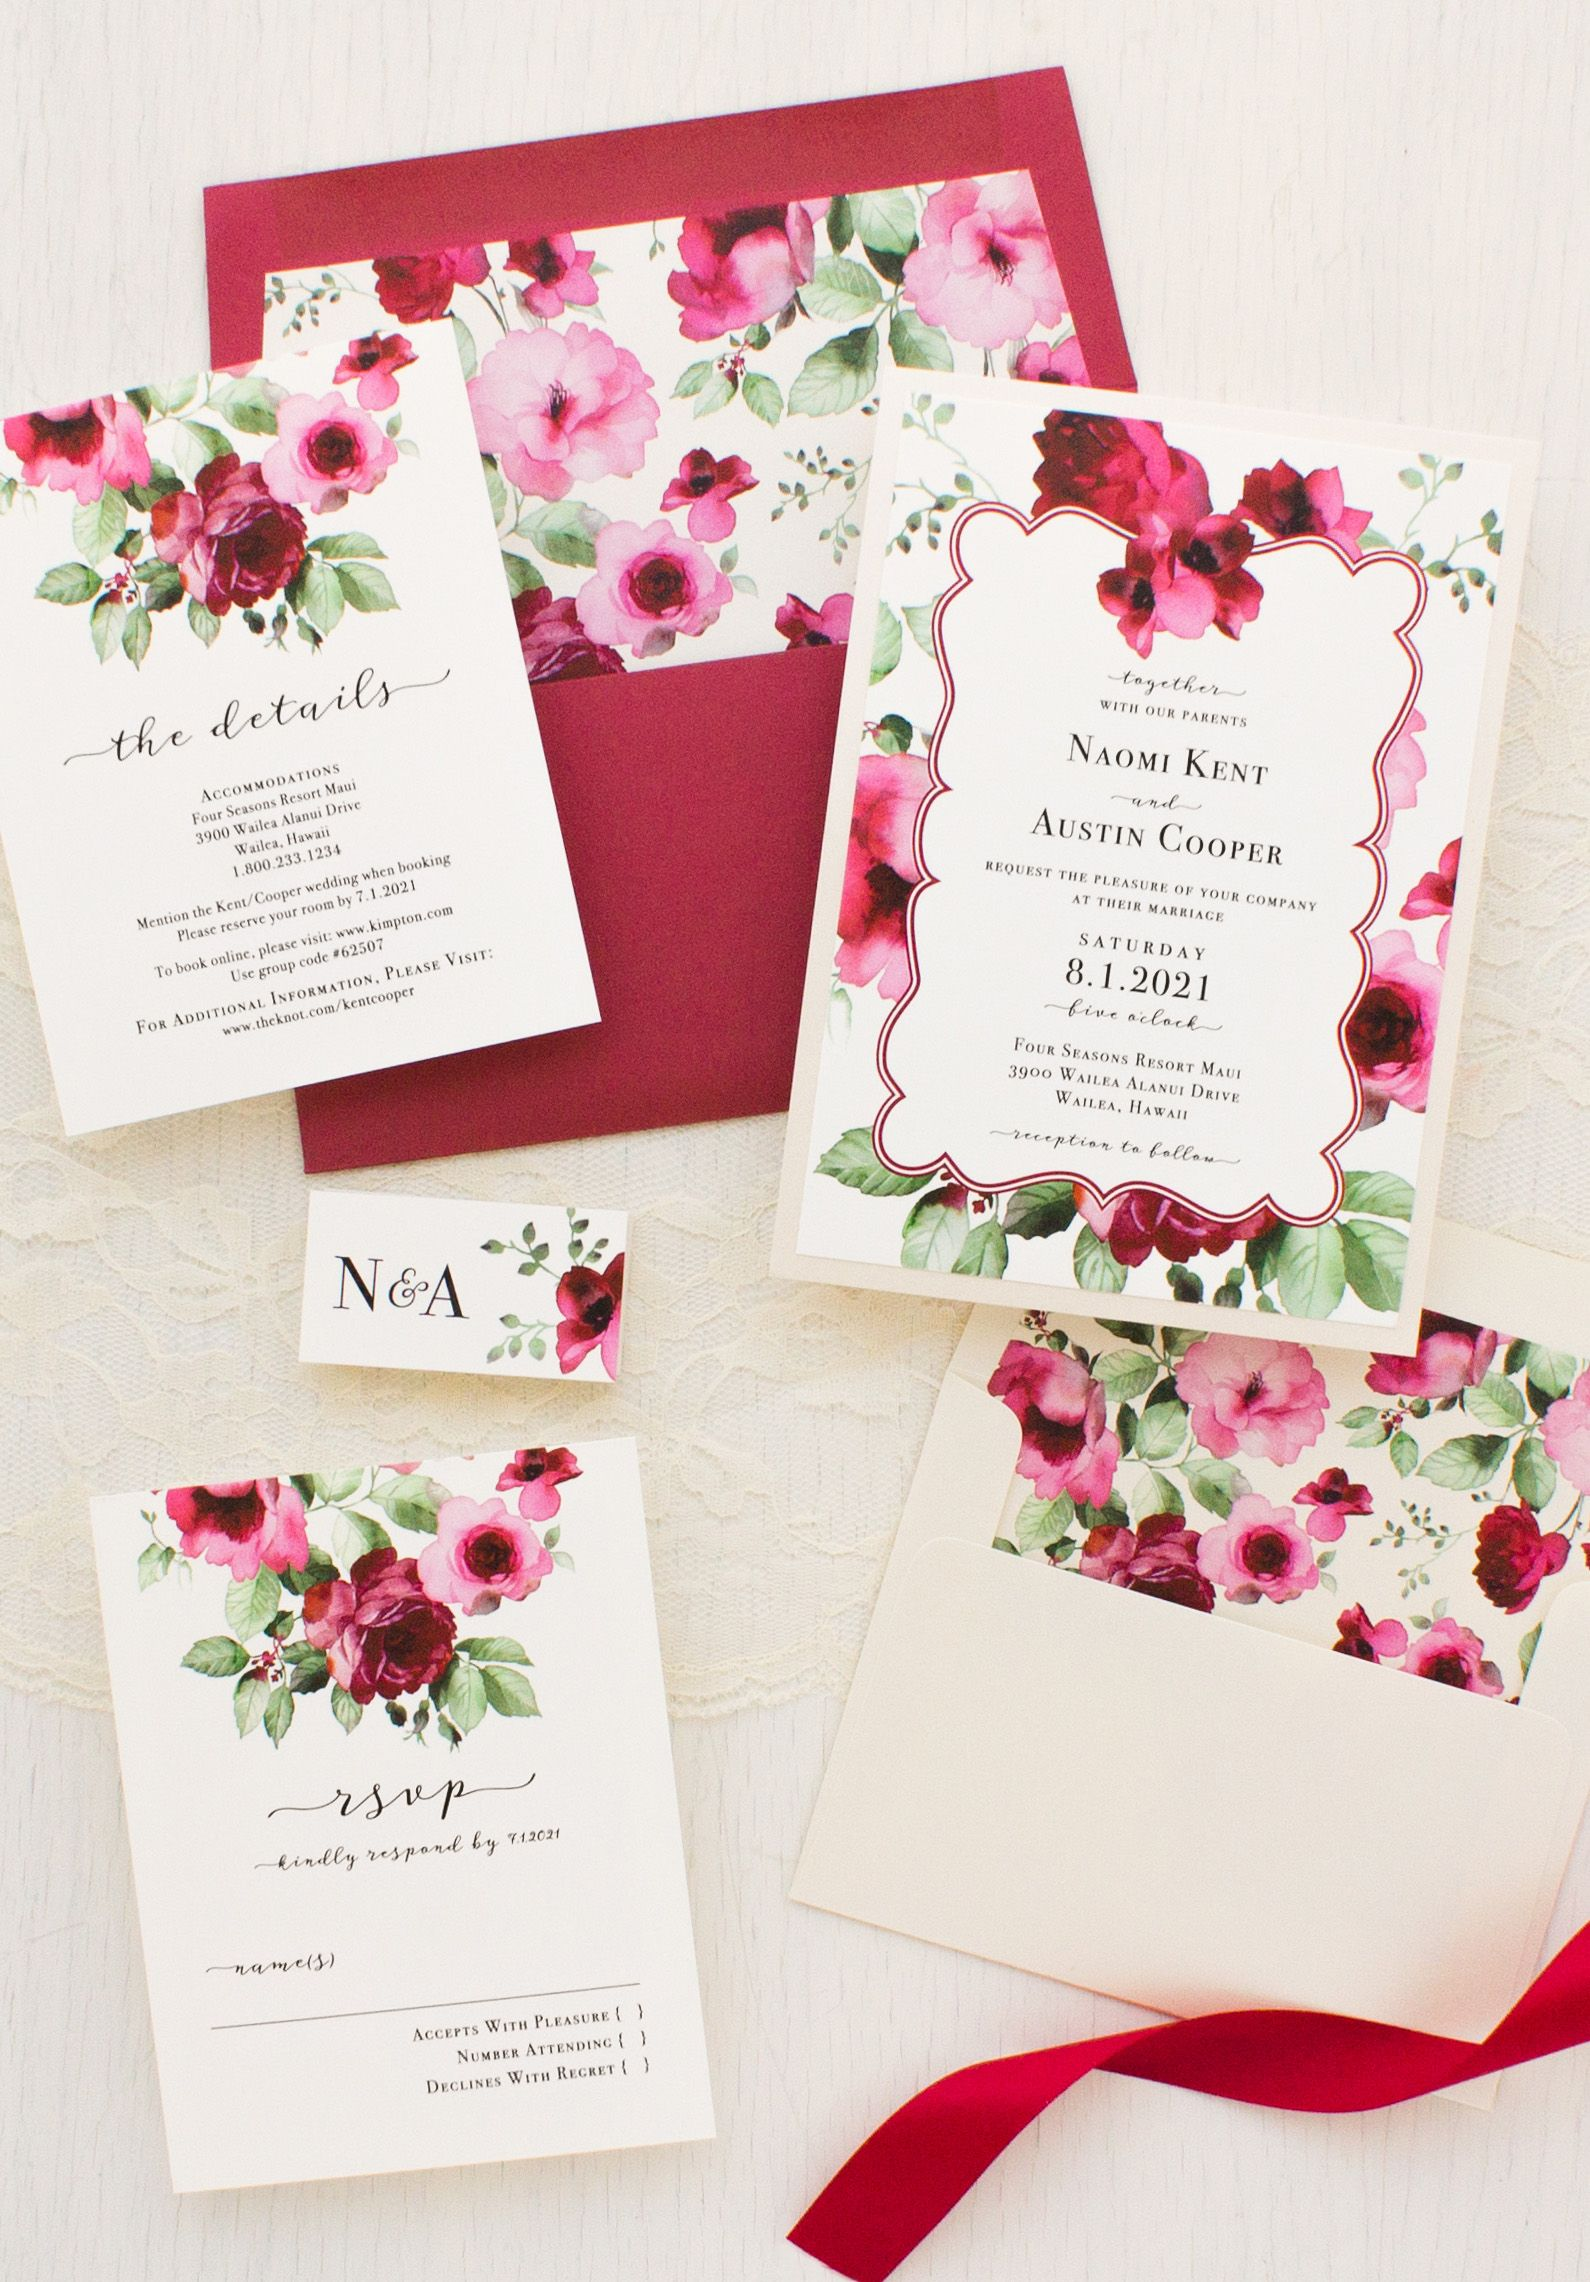 Crimson Floral Wedding Invitations | Beacon Lane Wedding Invitations | Wedding  invitation envelopes diy, Wedding invitations, Wedding invitations vintage  pink